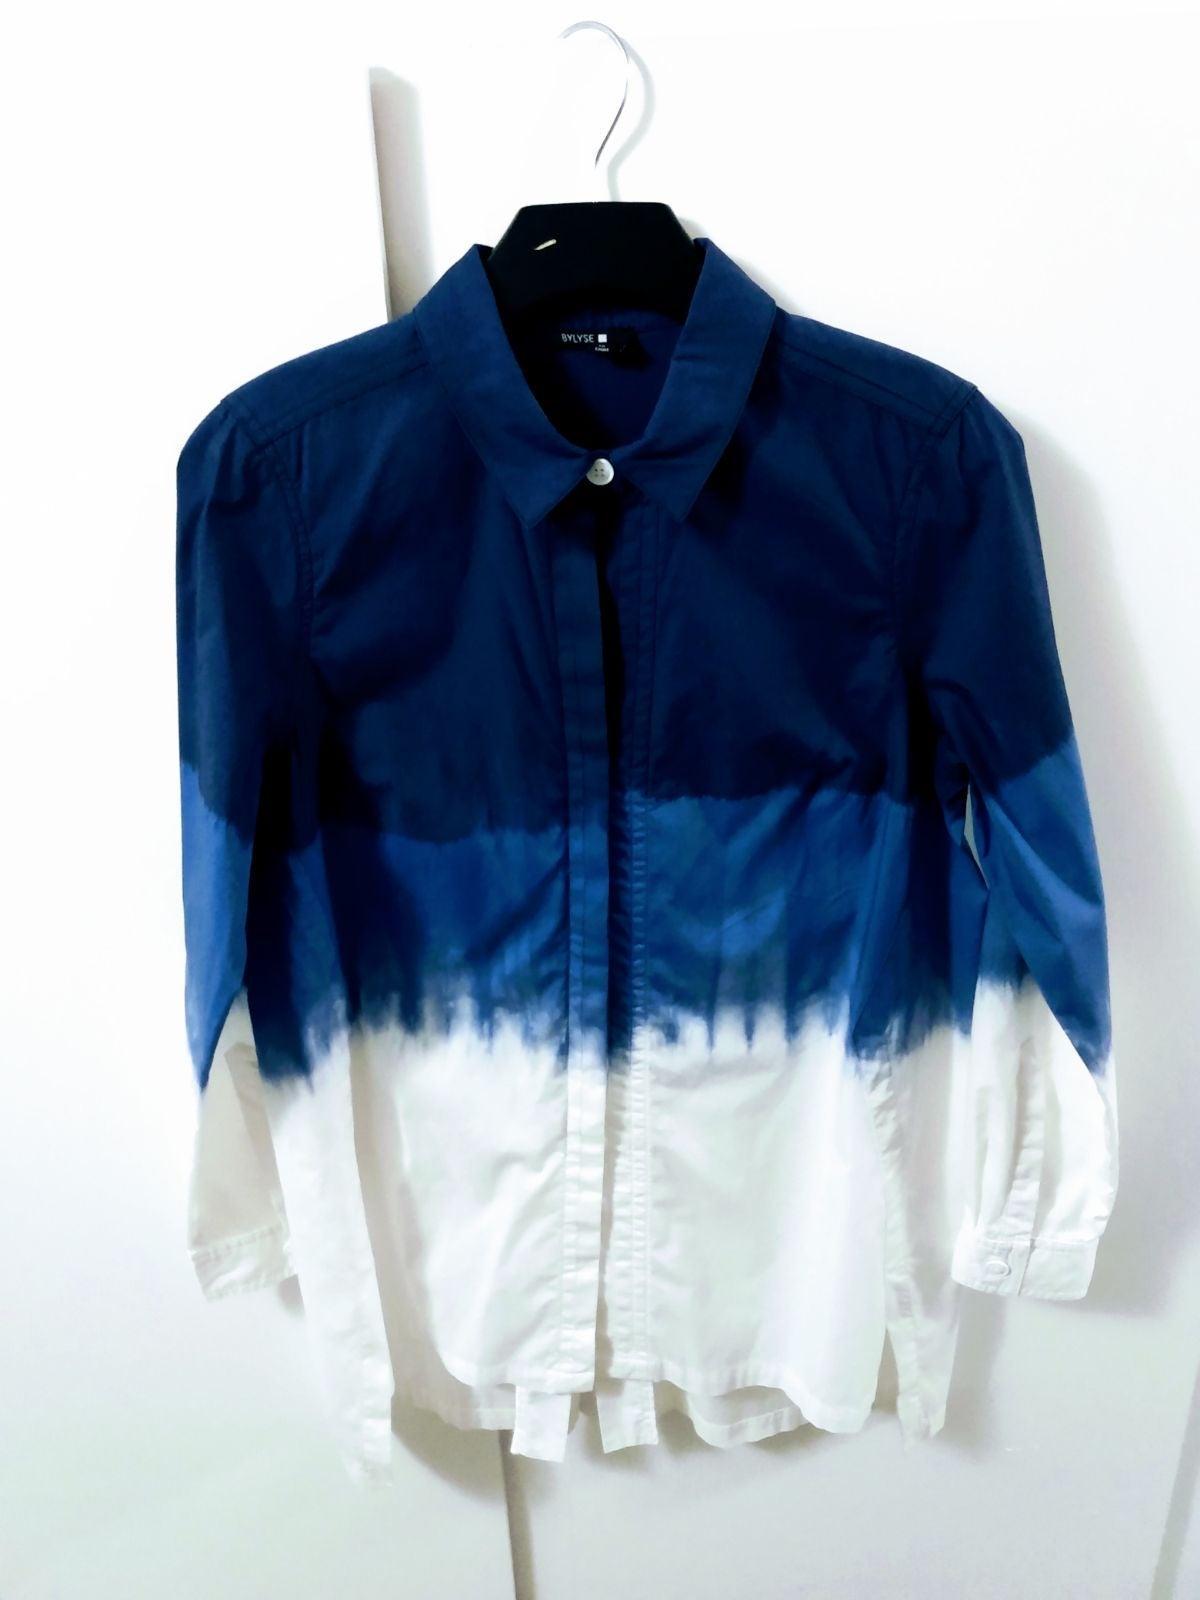 NWOT Bylyse Dip-Dye Button Down Shirt